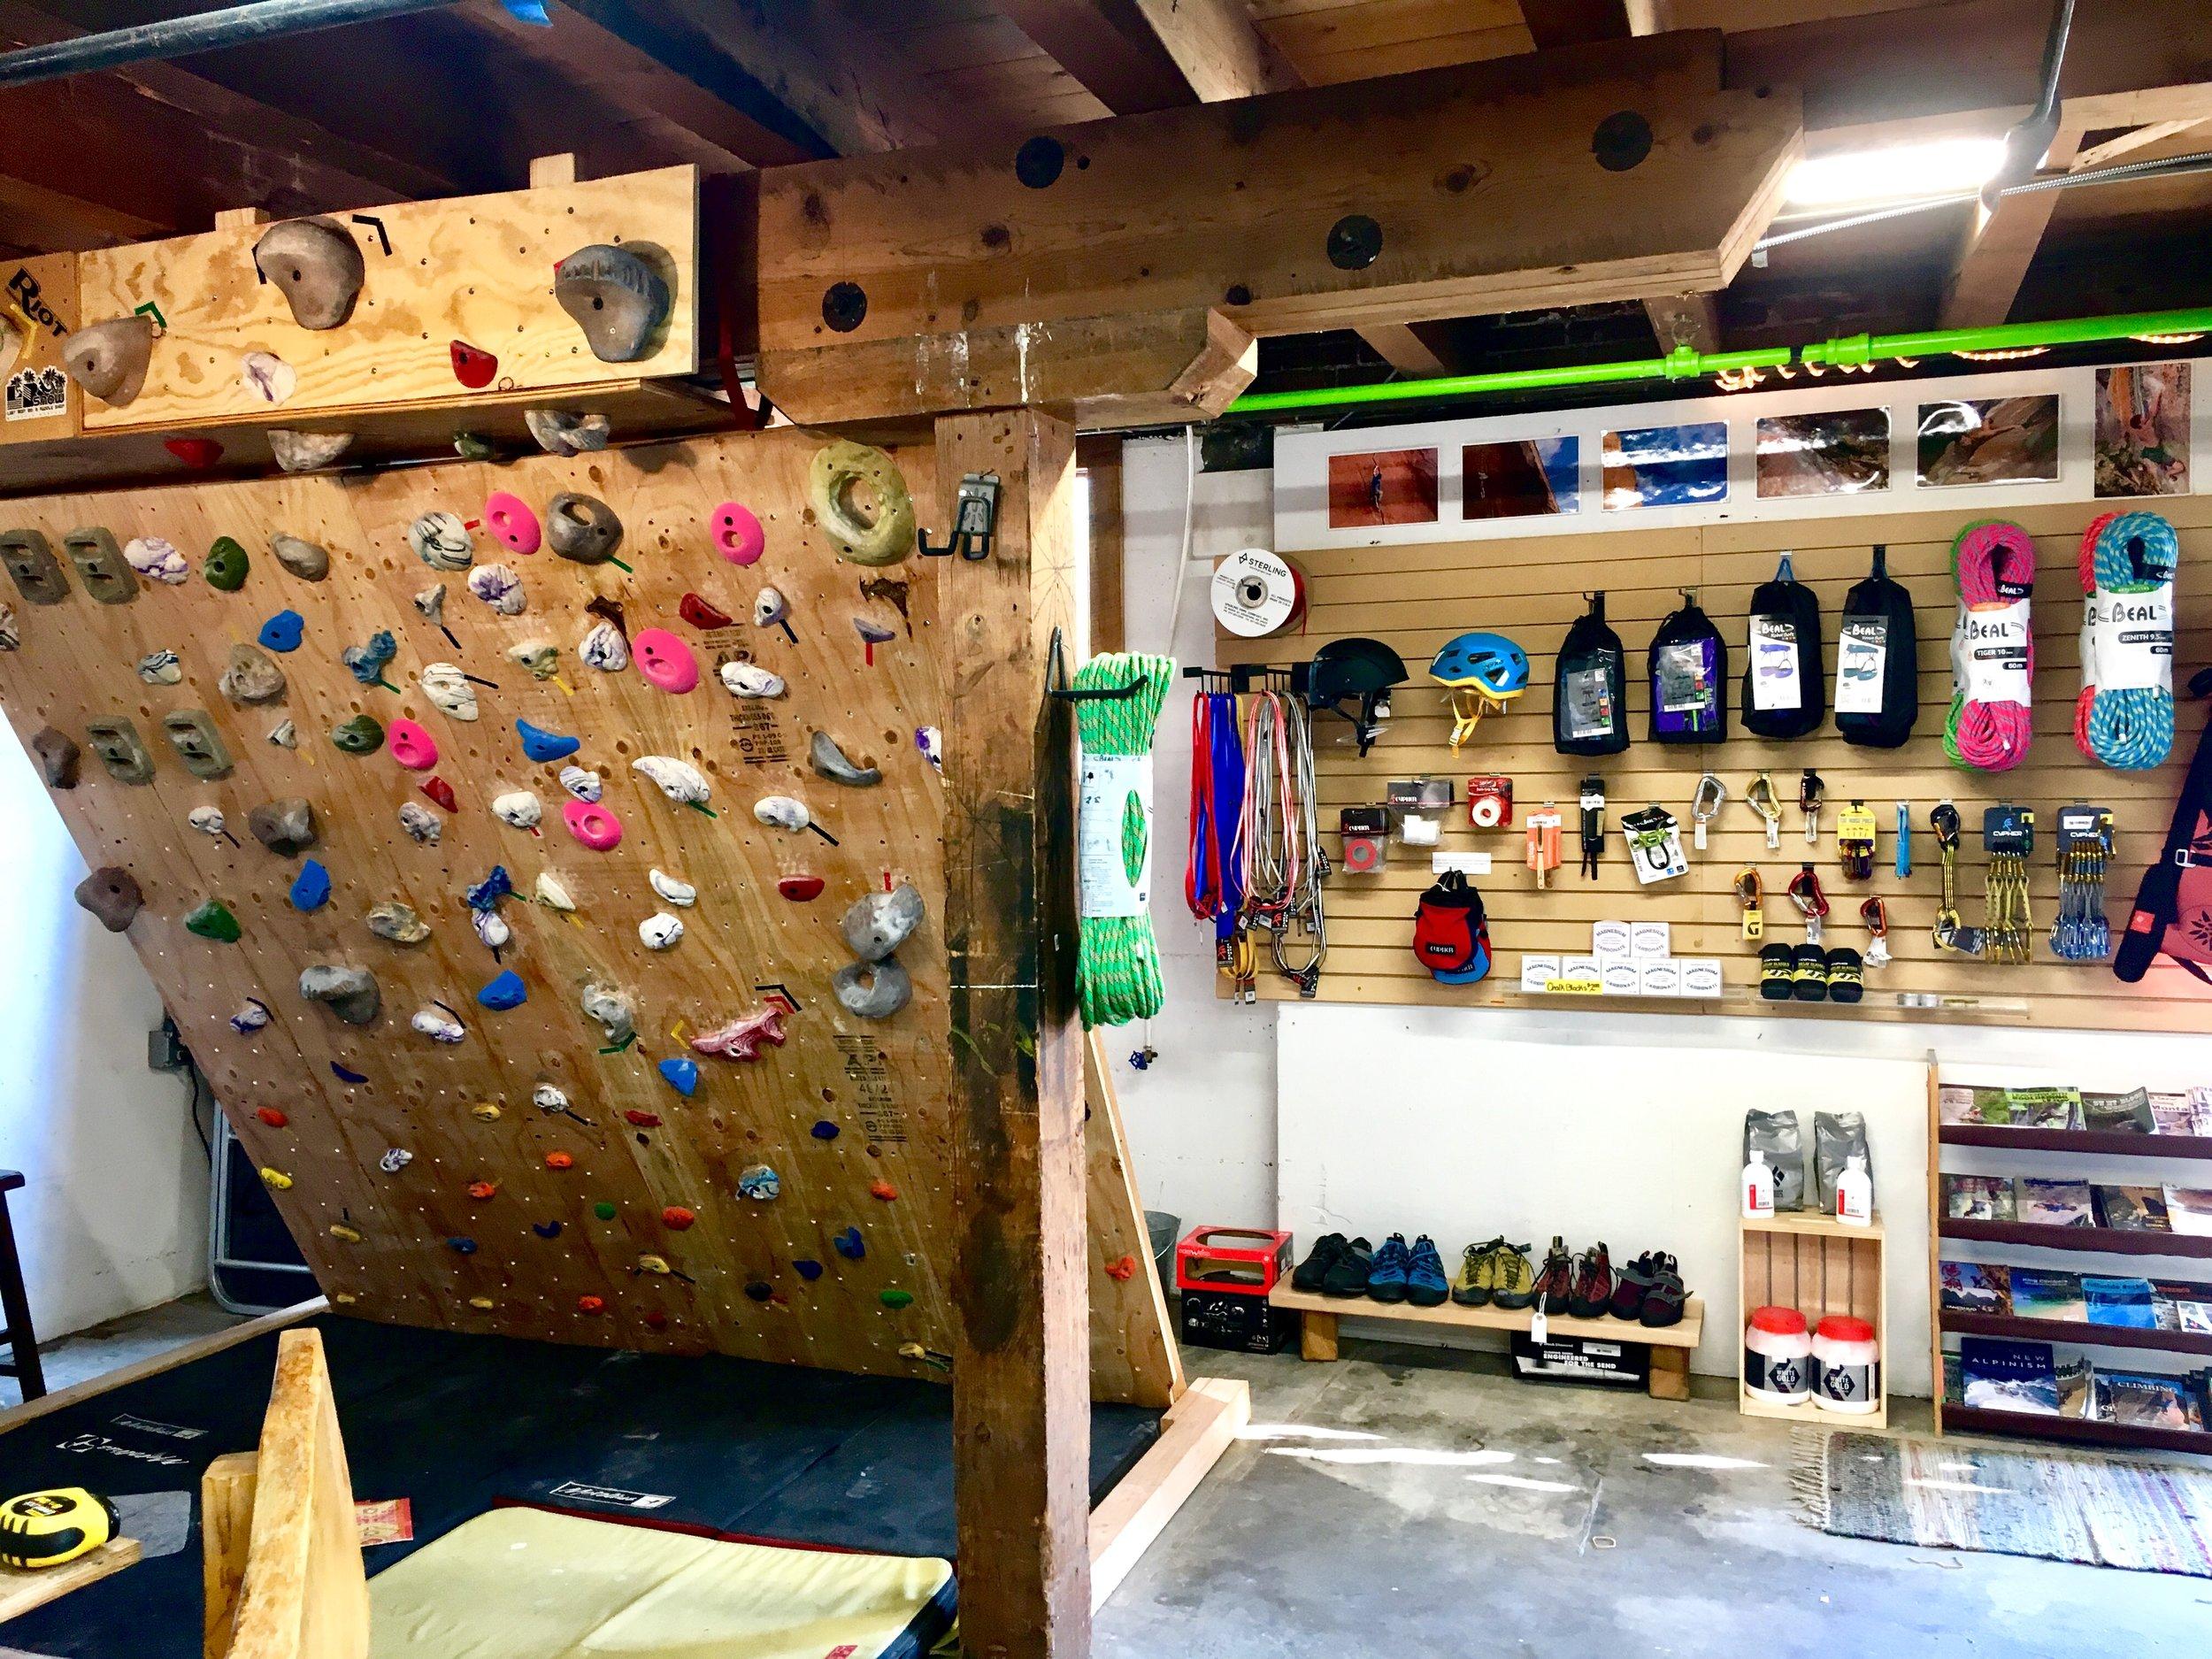 climbing wall and gear shot.jpg